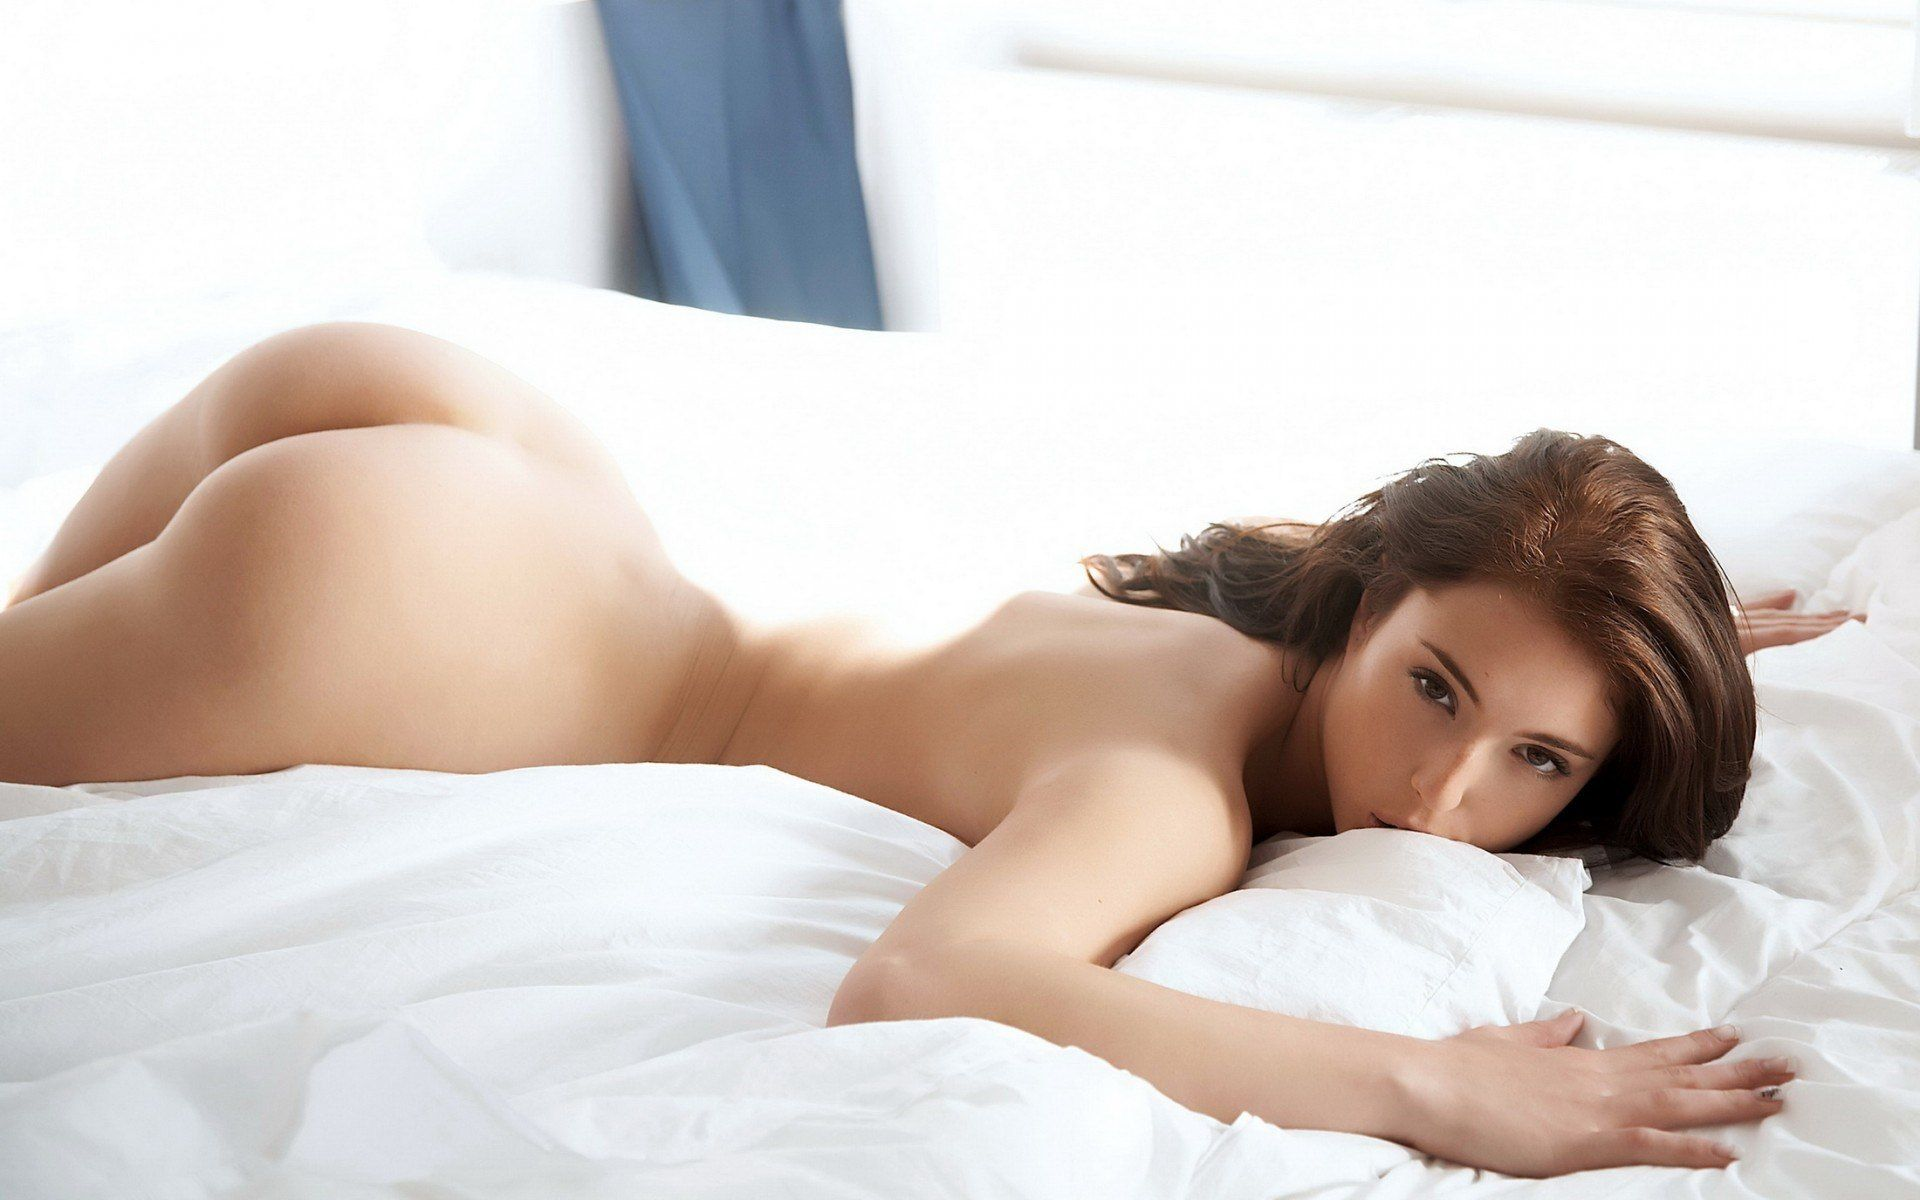 Adriana chase anal